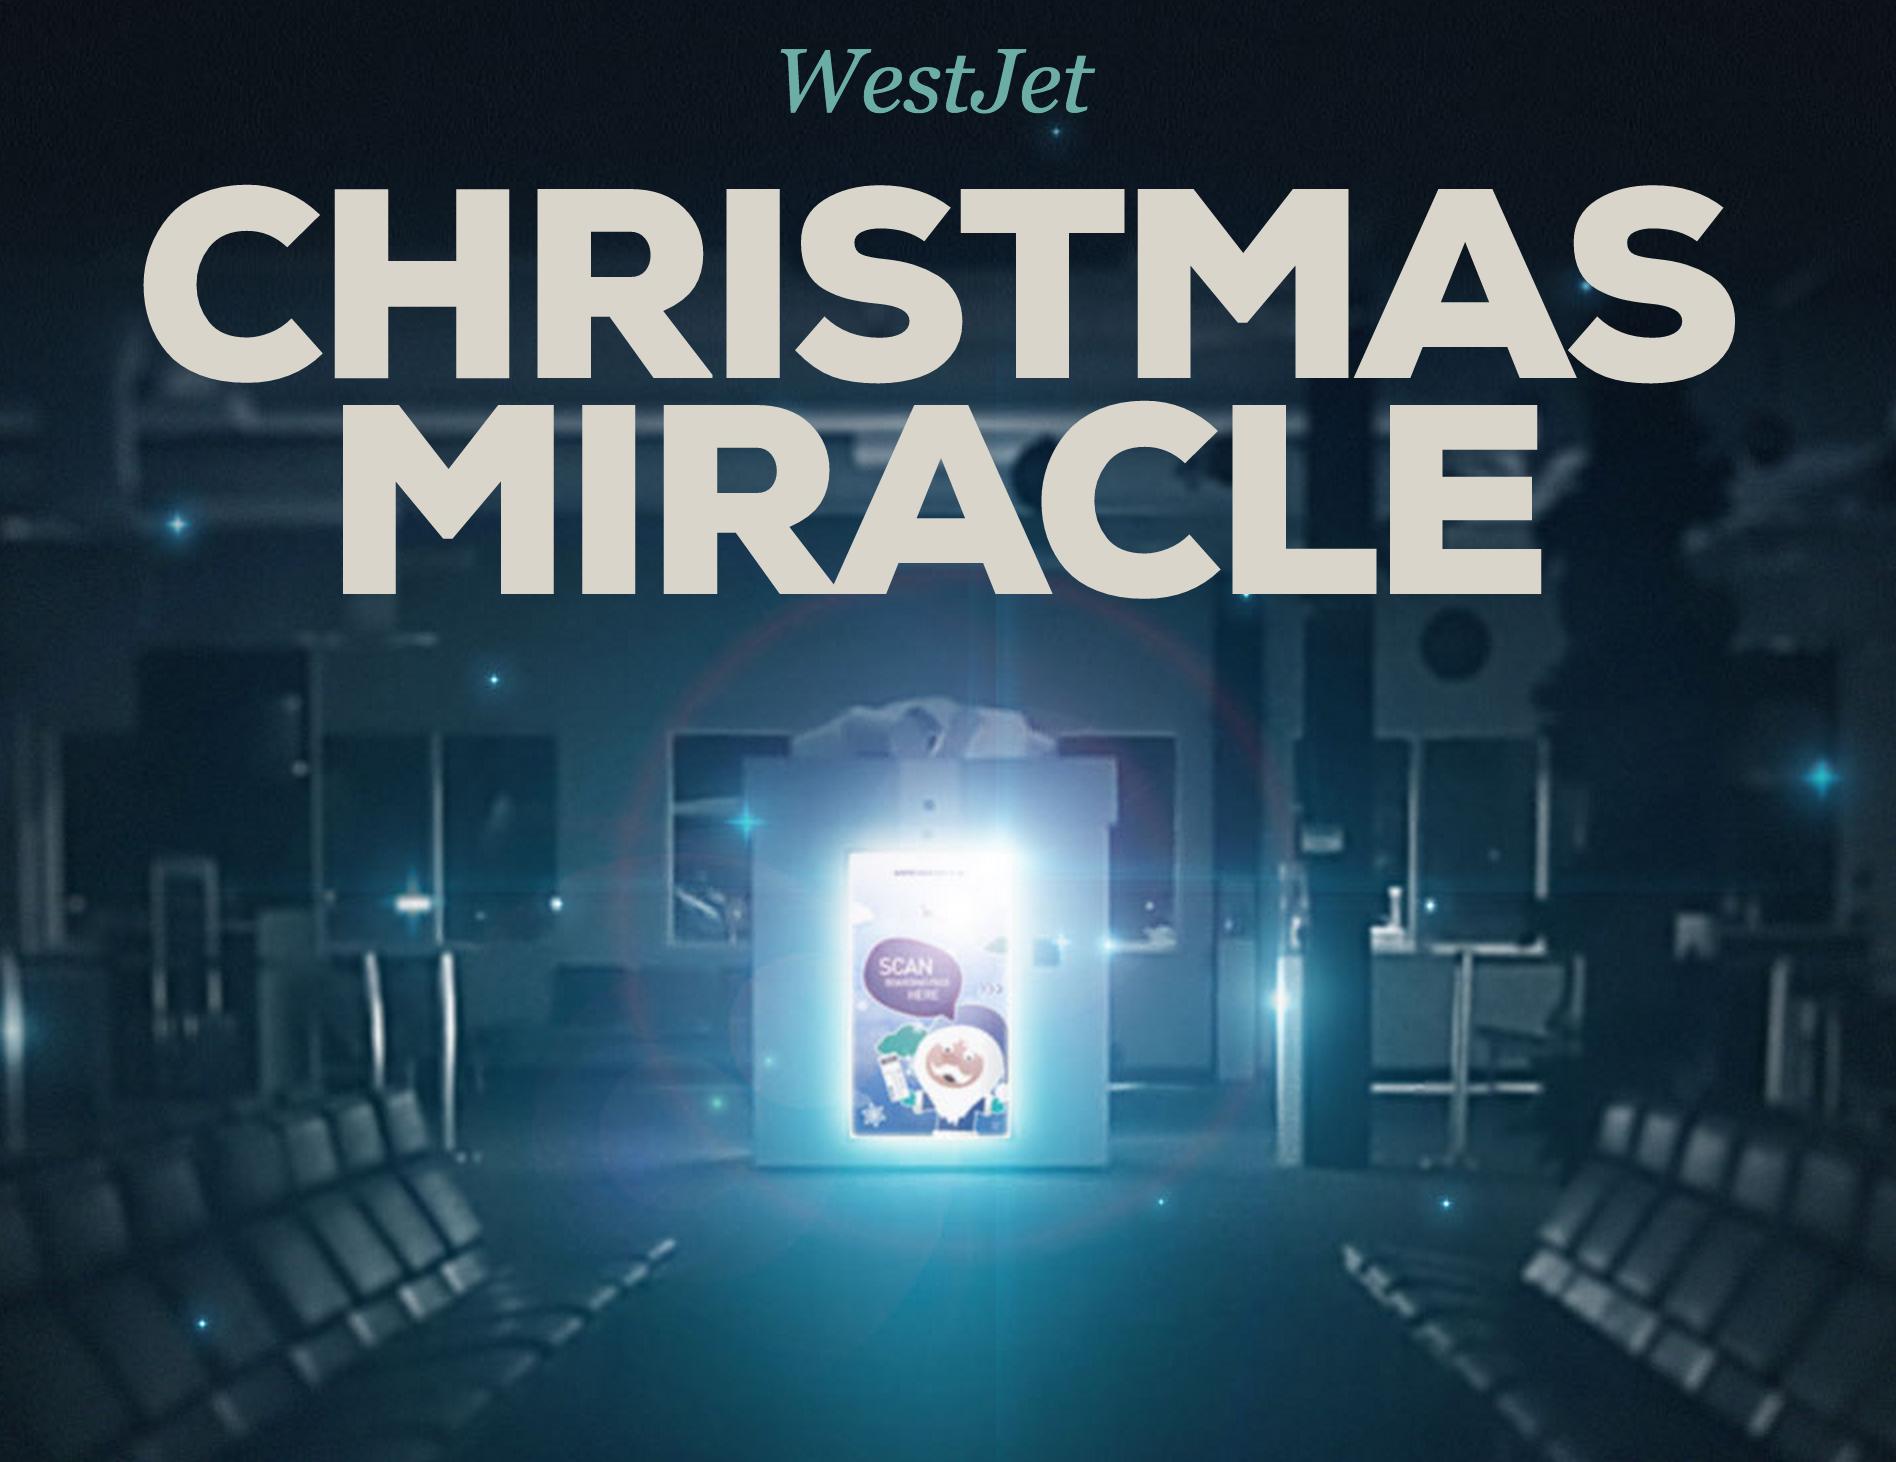 WestJet Xmas Miracle wins Bronze Cyber Lion at Cannes Lions ...